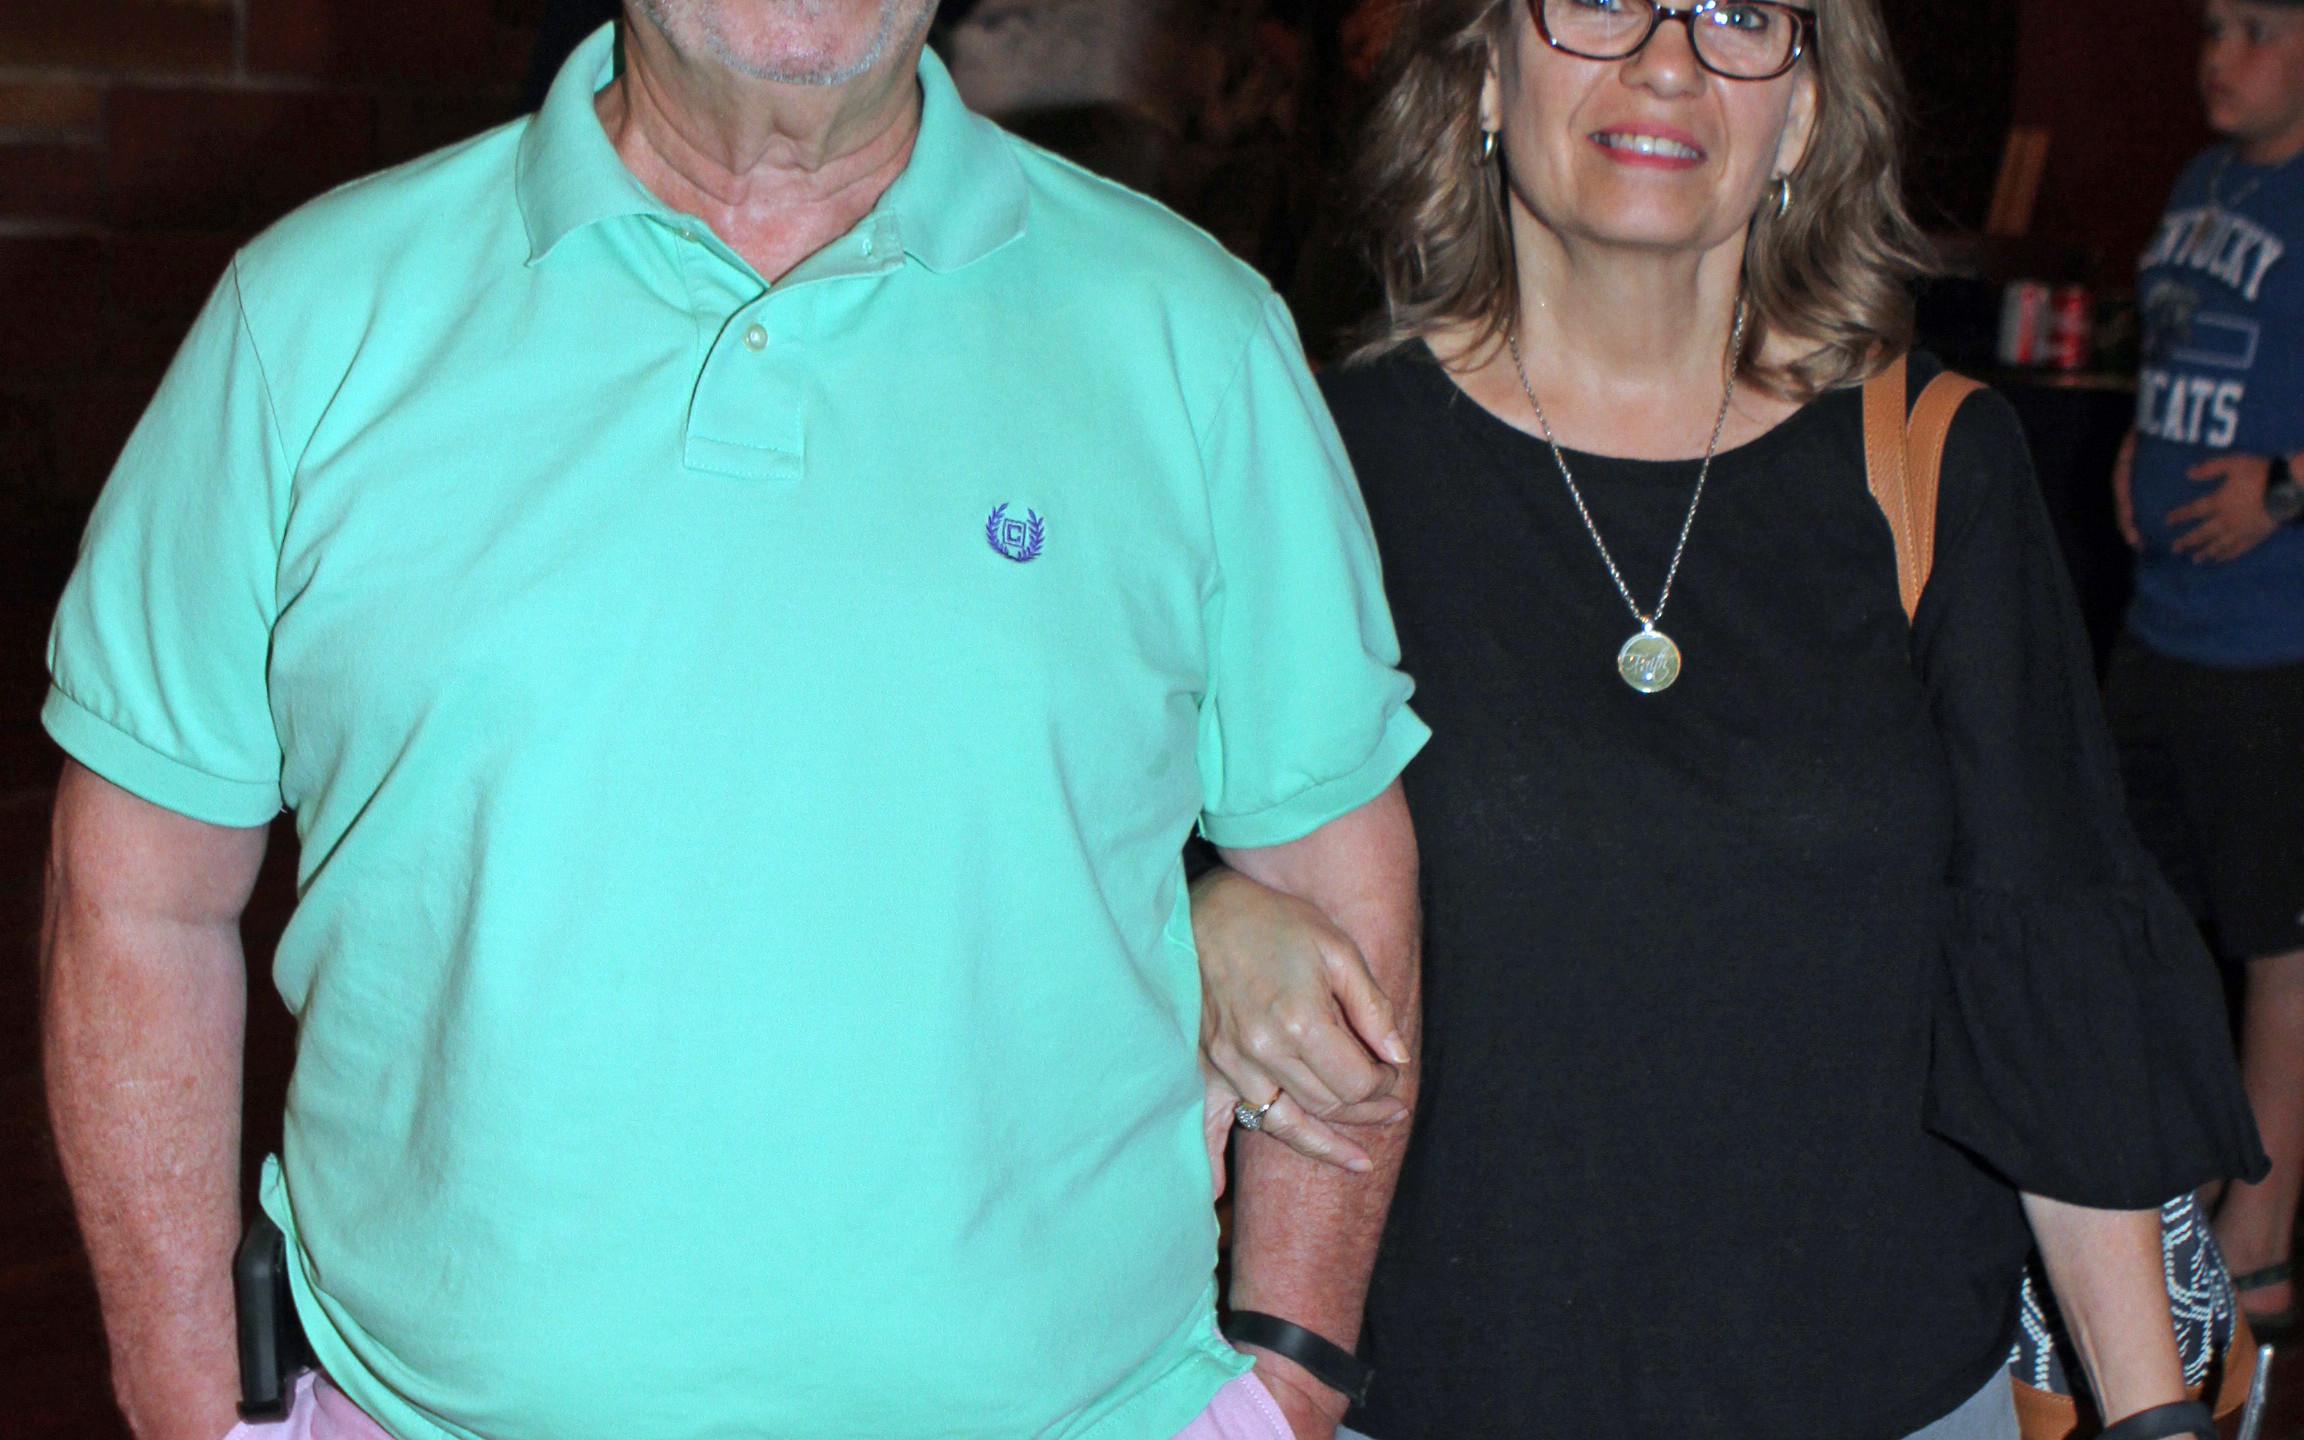 Richard & Debbie Olp